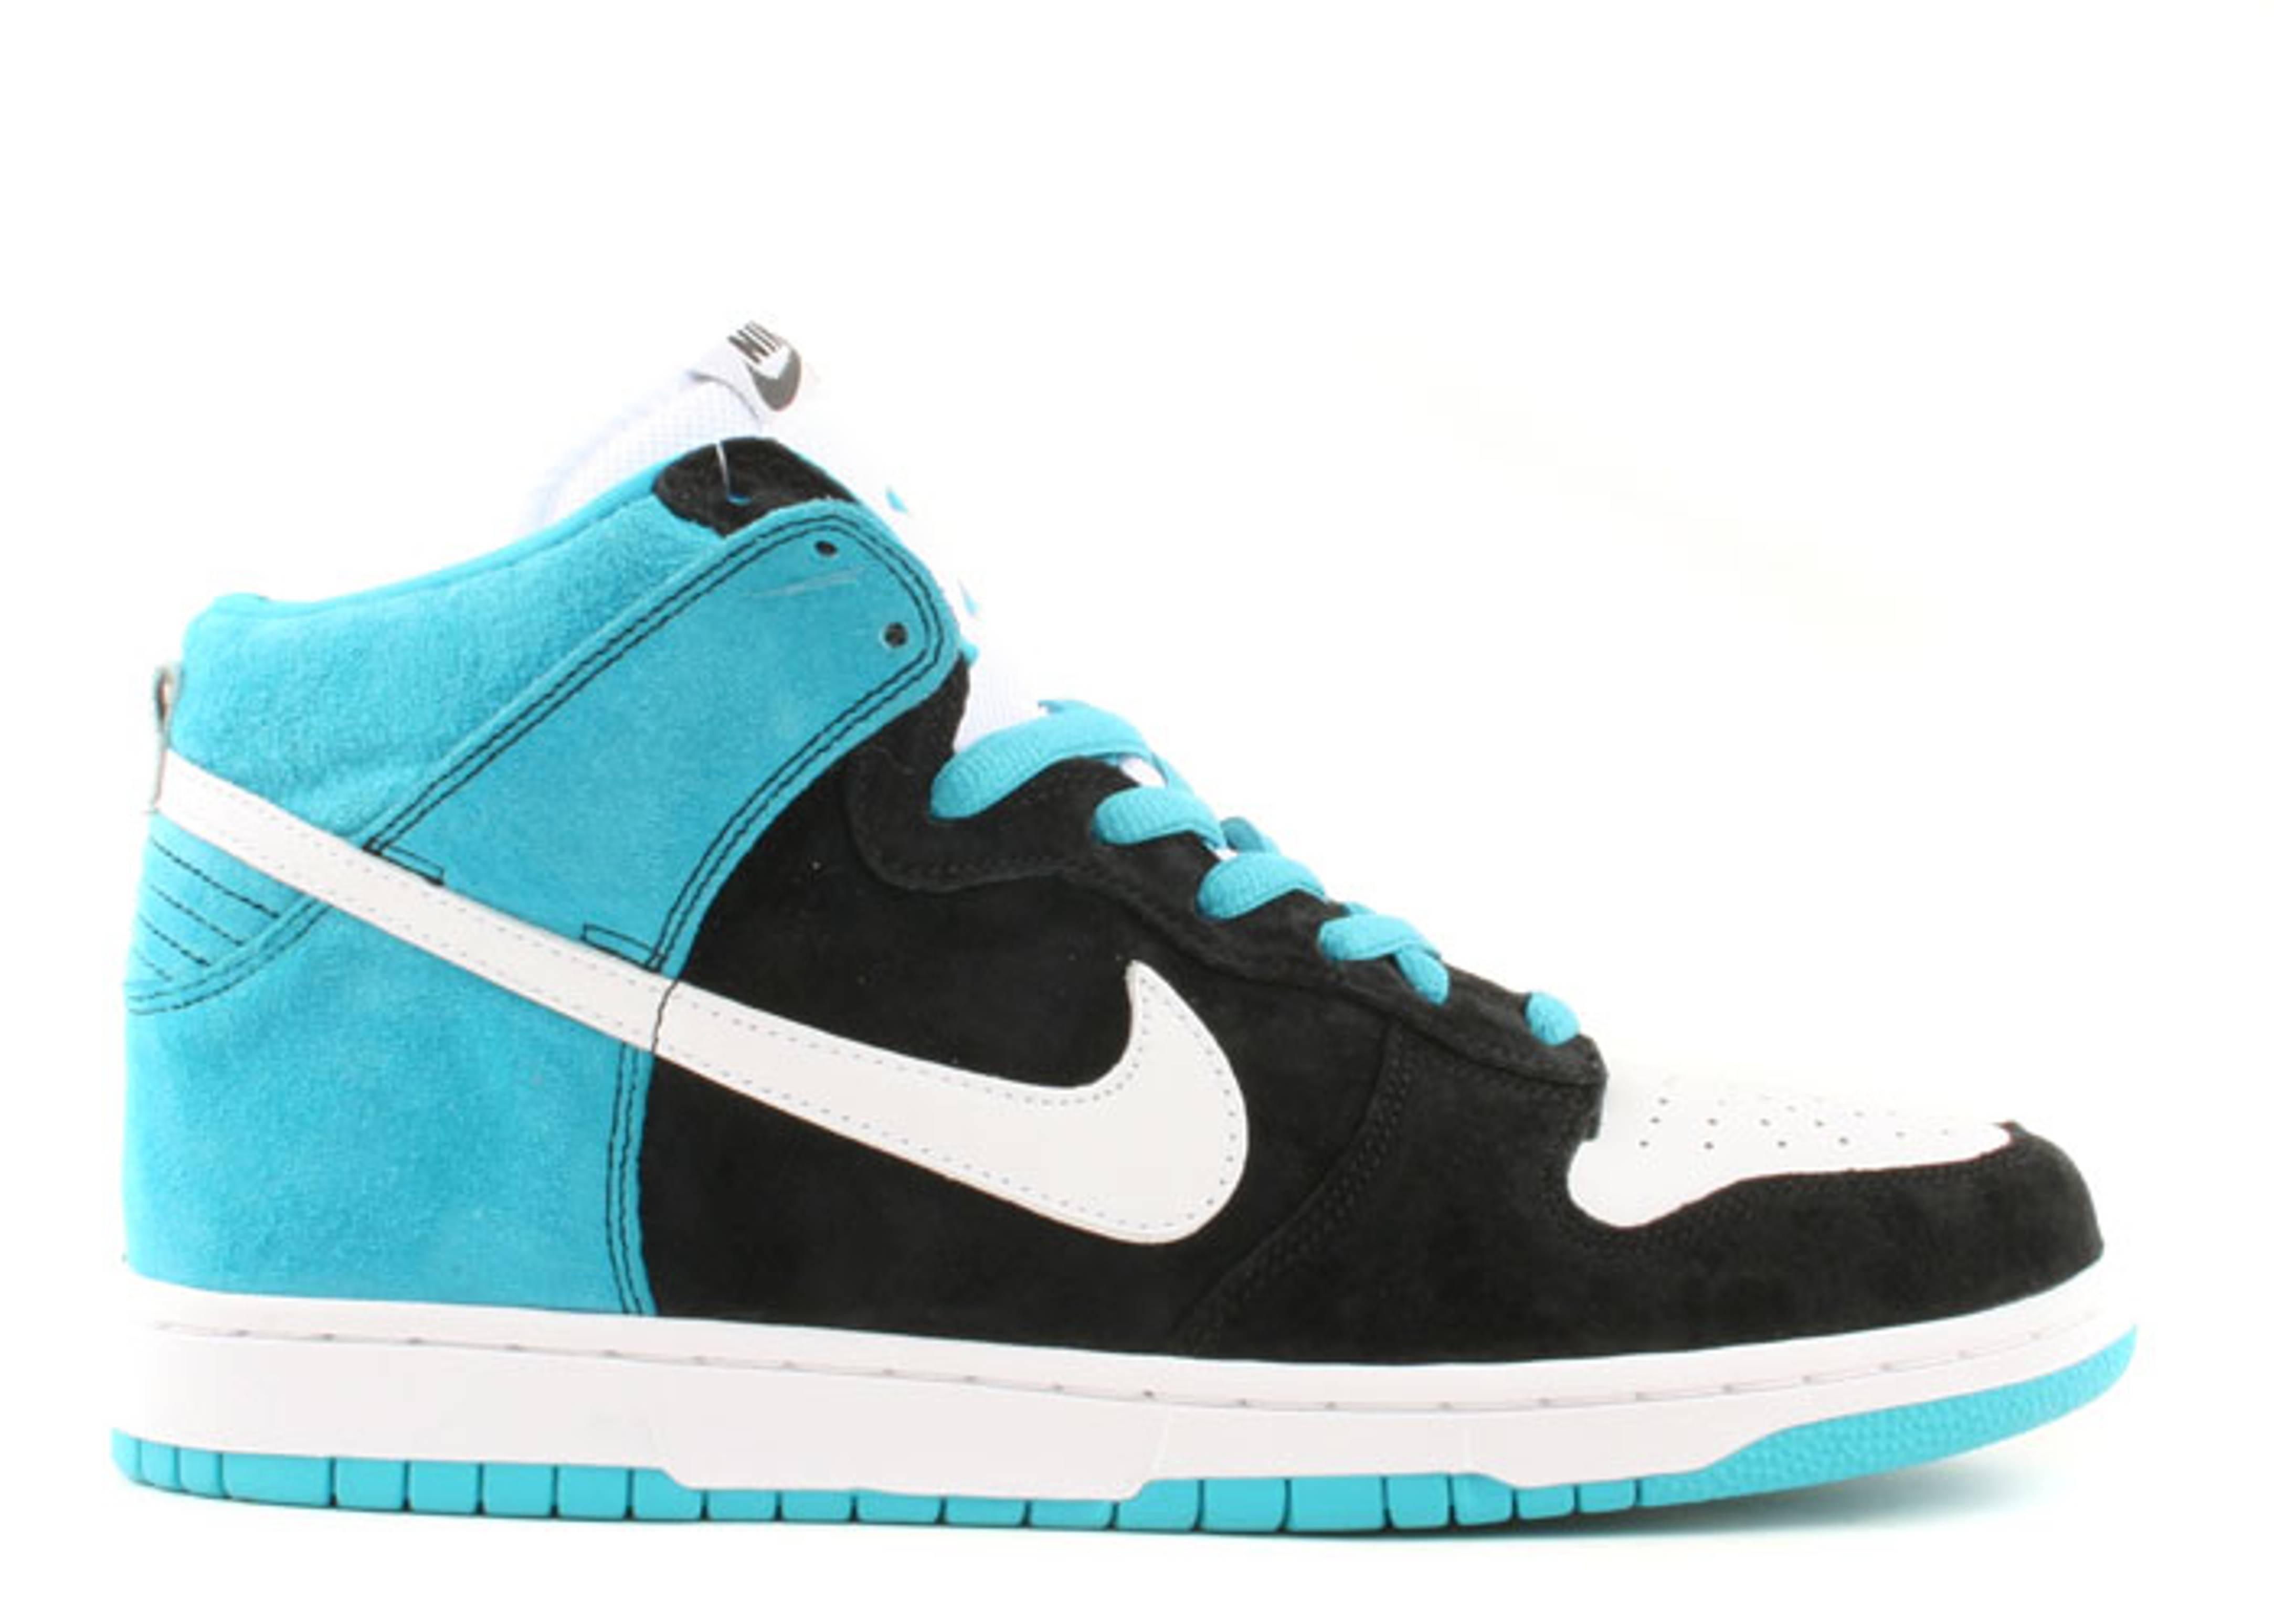 Nike Dunk High SB Send Help Black Purple White Shoes